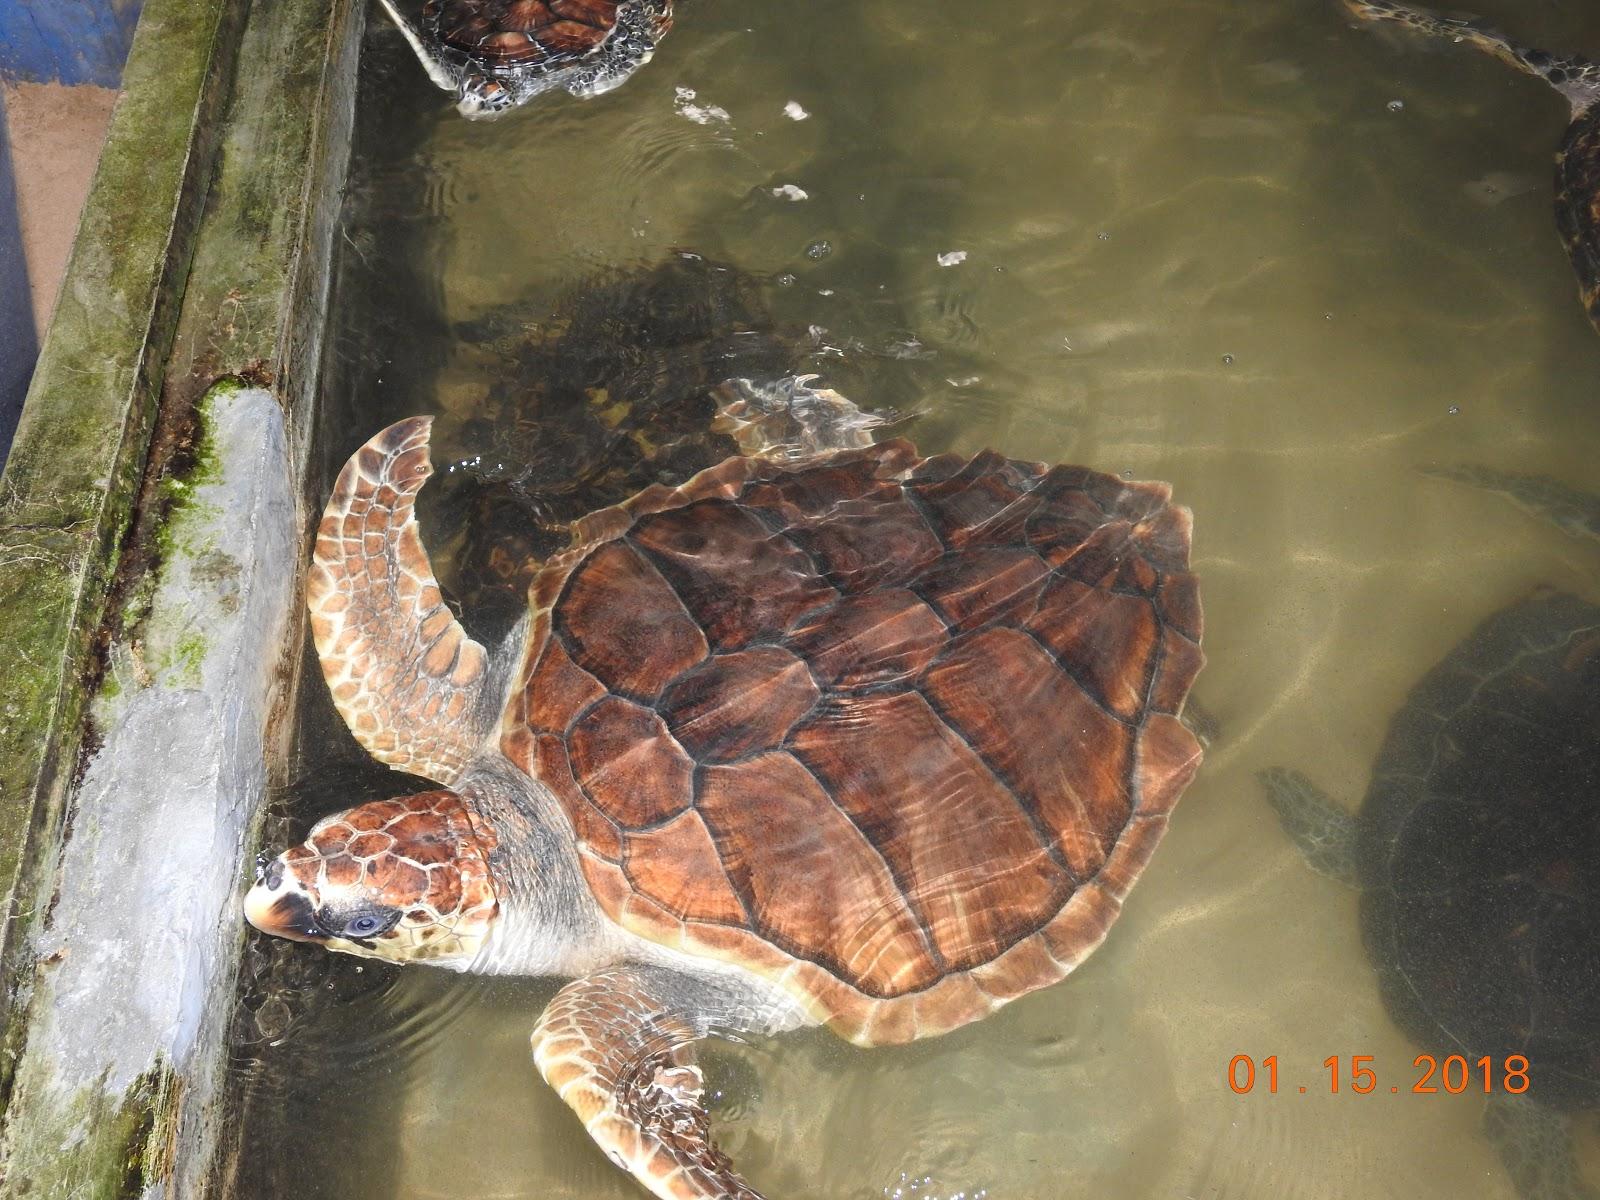 invite-to-paradise-sri-lanka-maldives-holiday-specialists-nutan-vidyut-patel-turtle.jpg